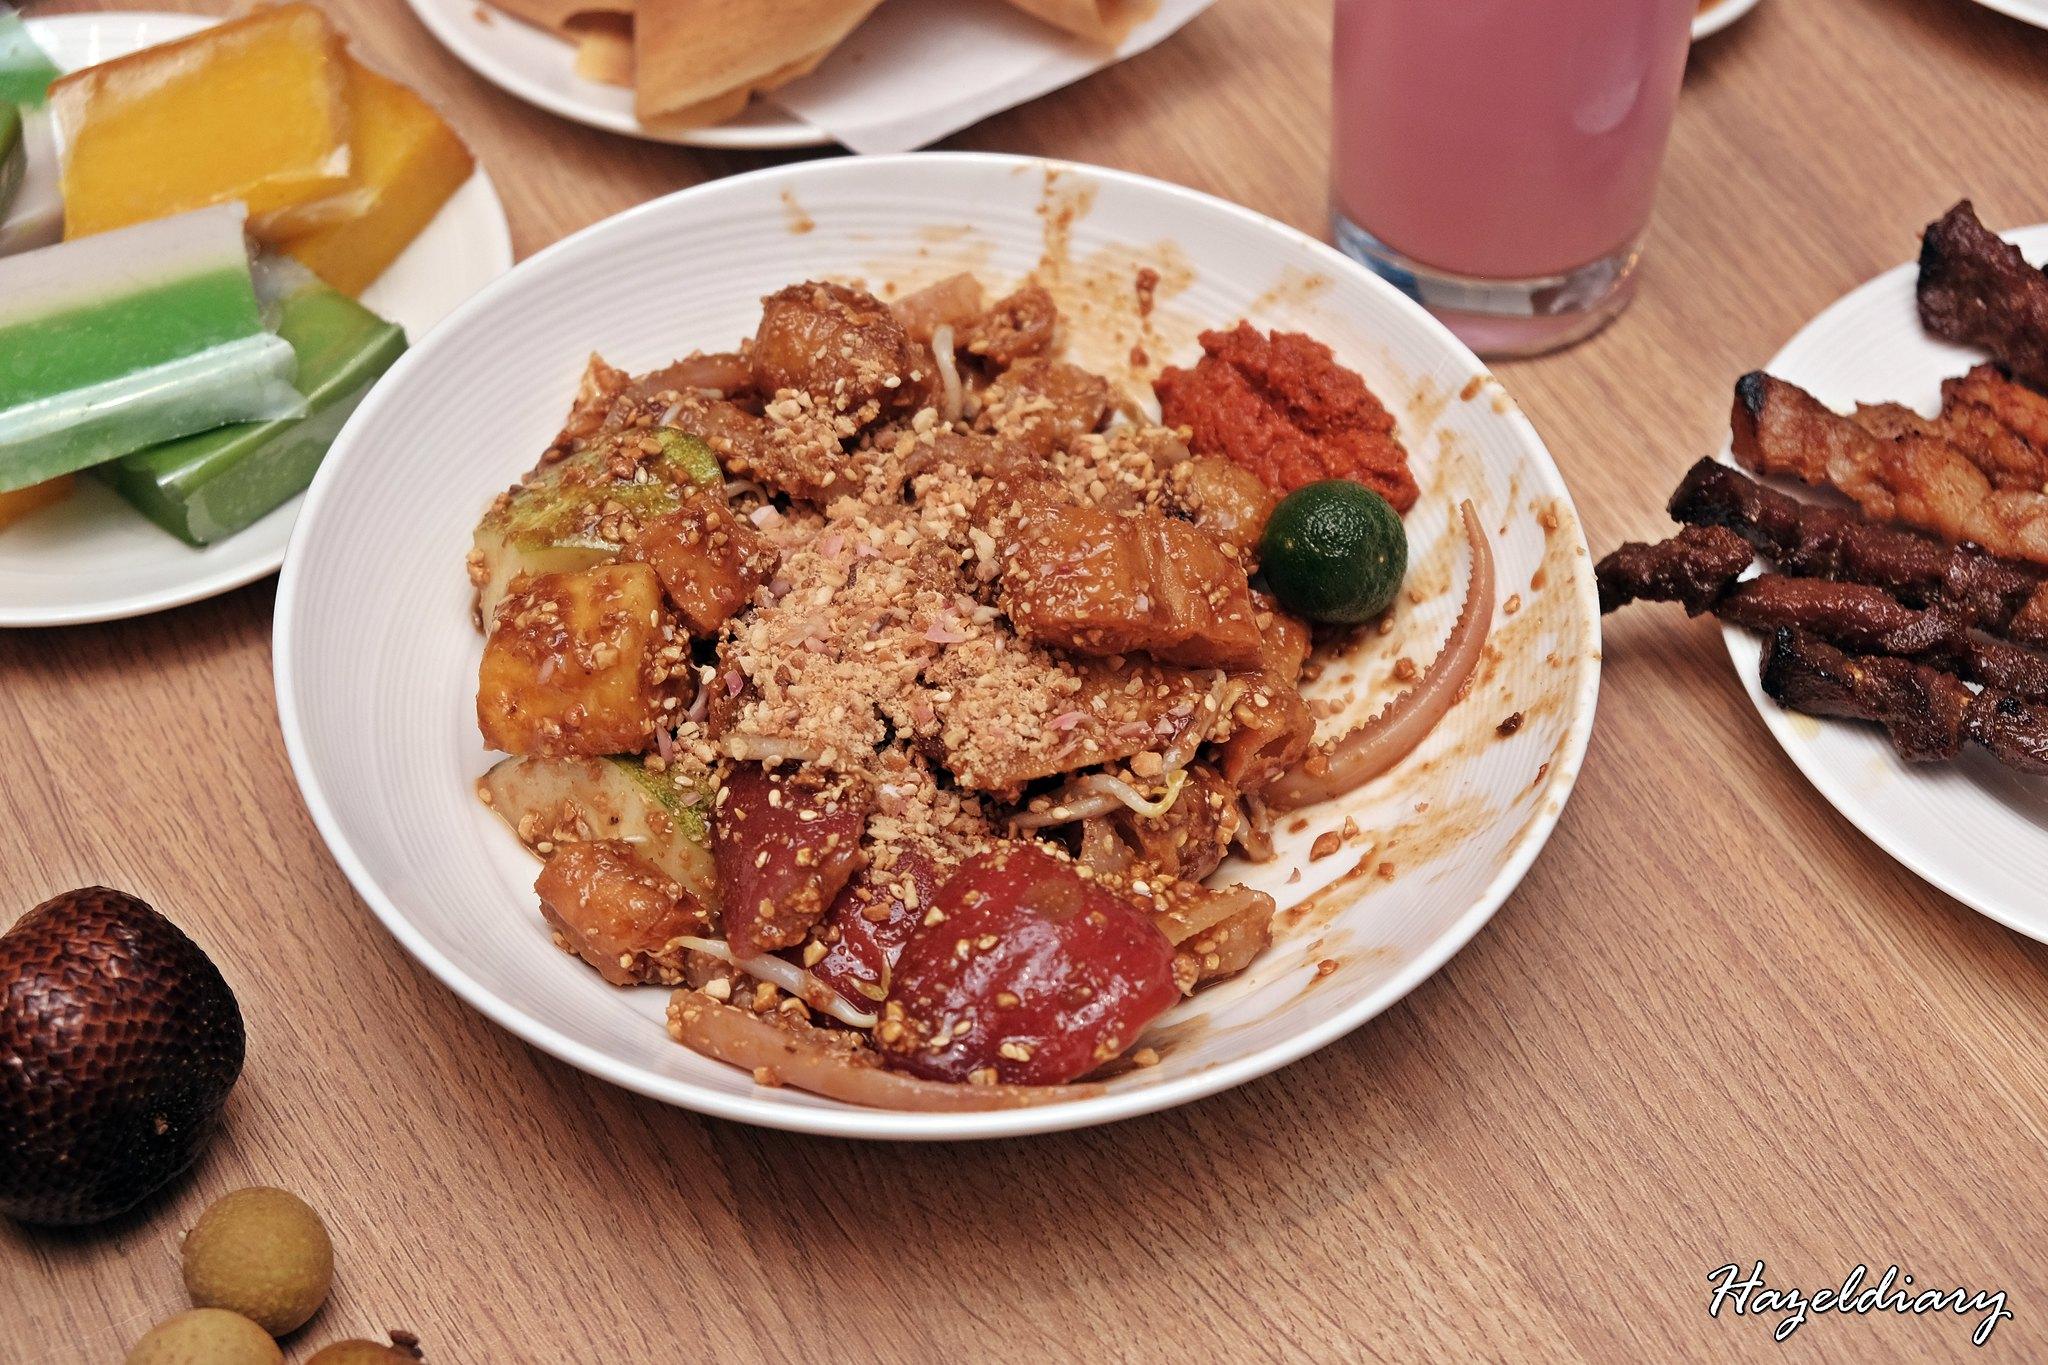 Penang Food Fare Buffet-Sky22 Courtyard Marriott-Penang Rojak